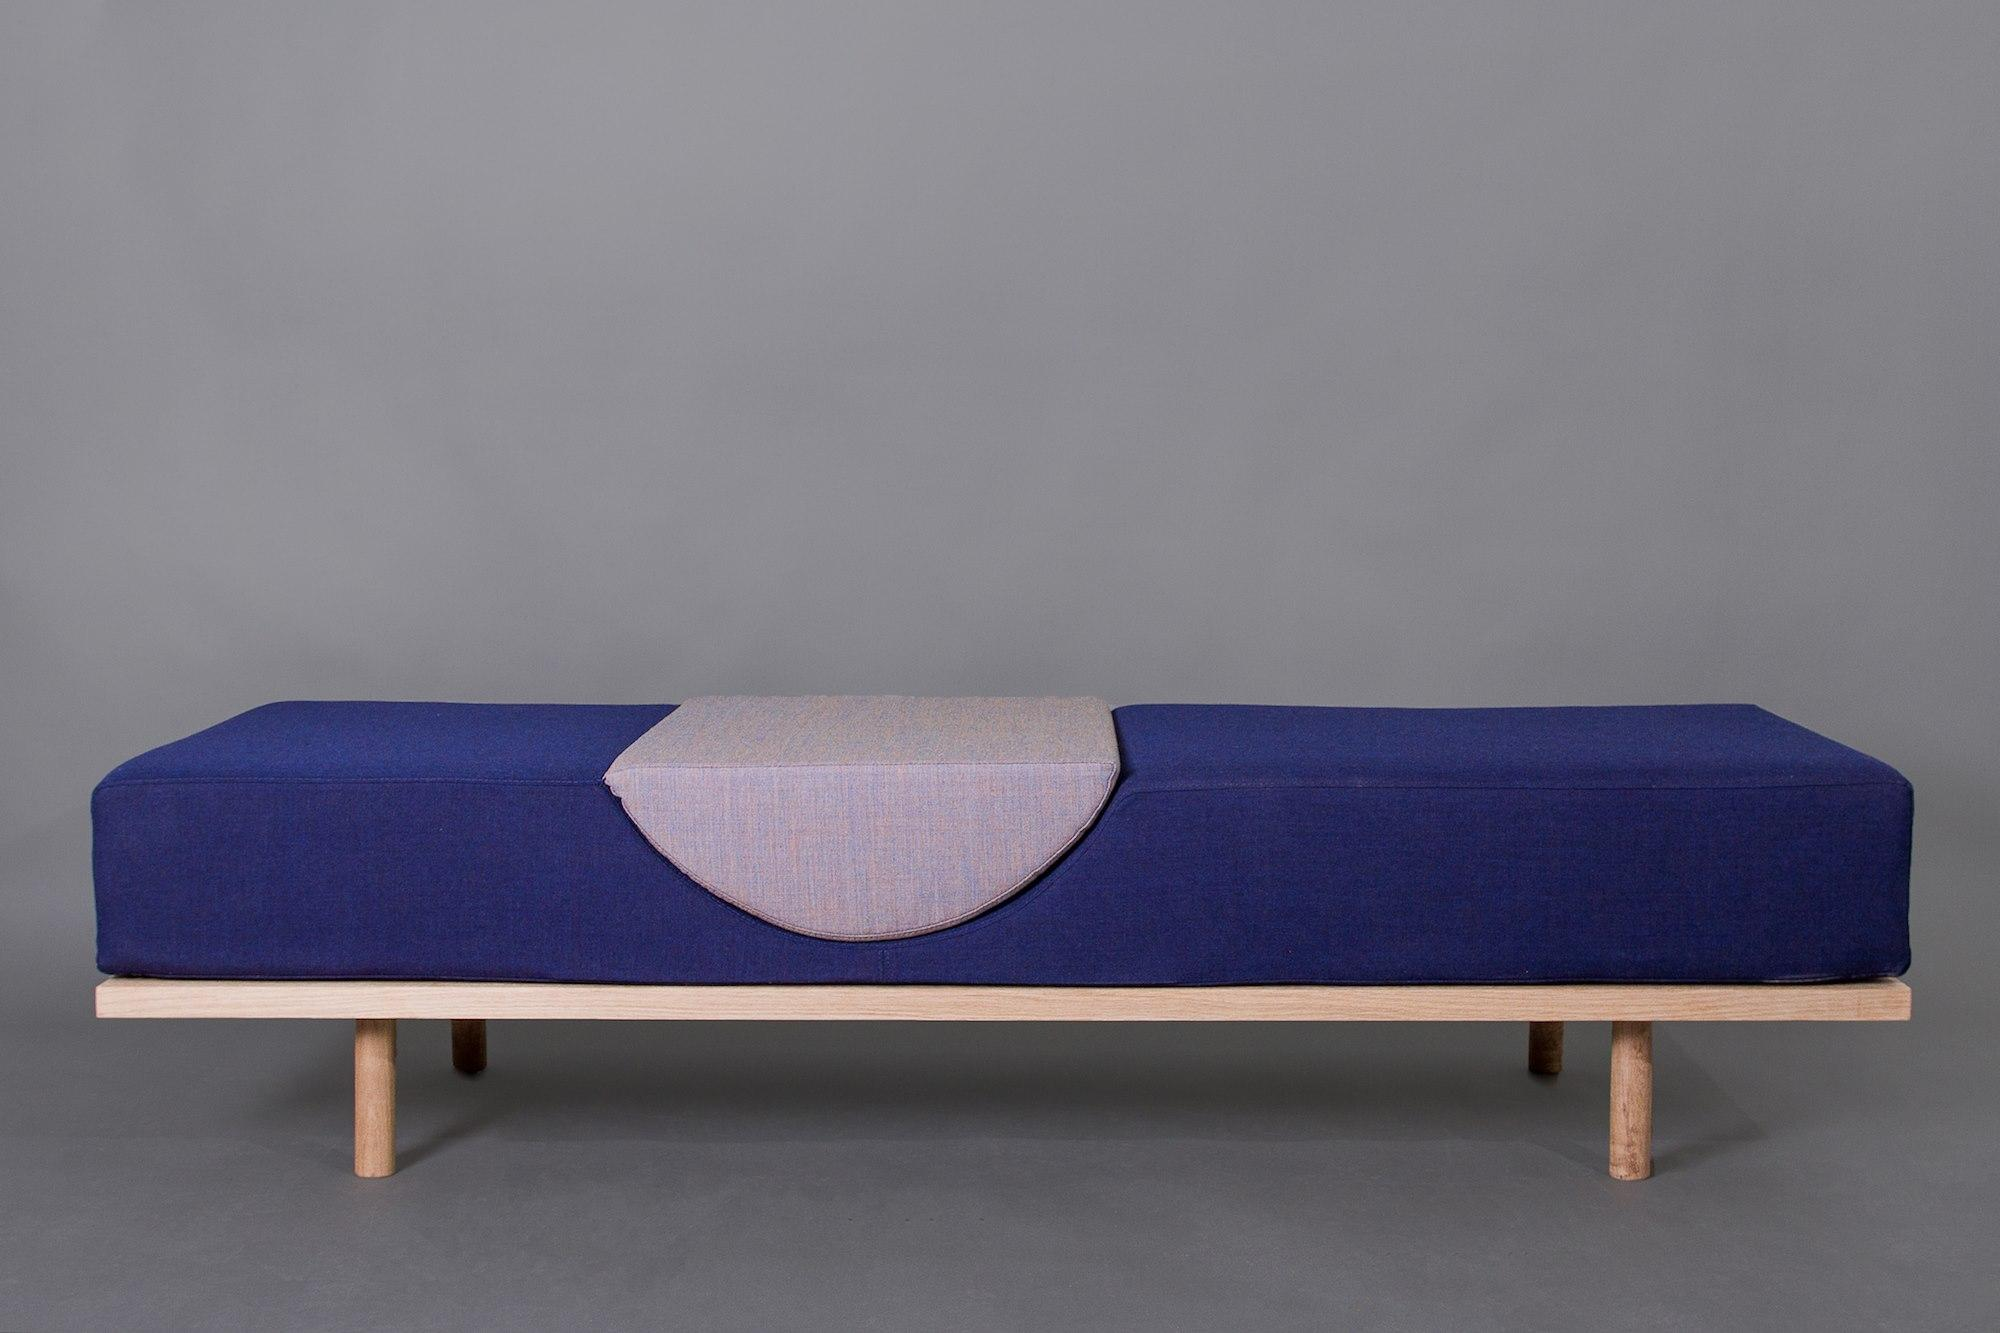 furniture-for-a-norvegian-prisiners01